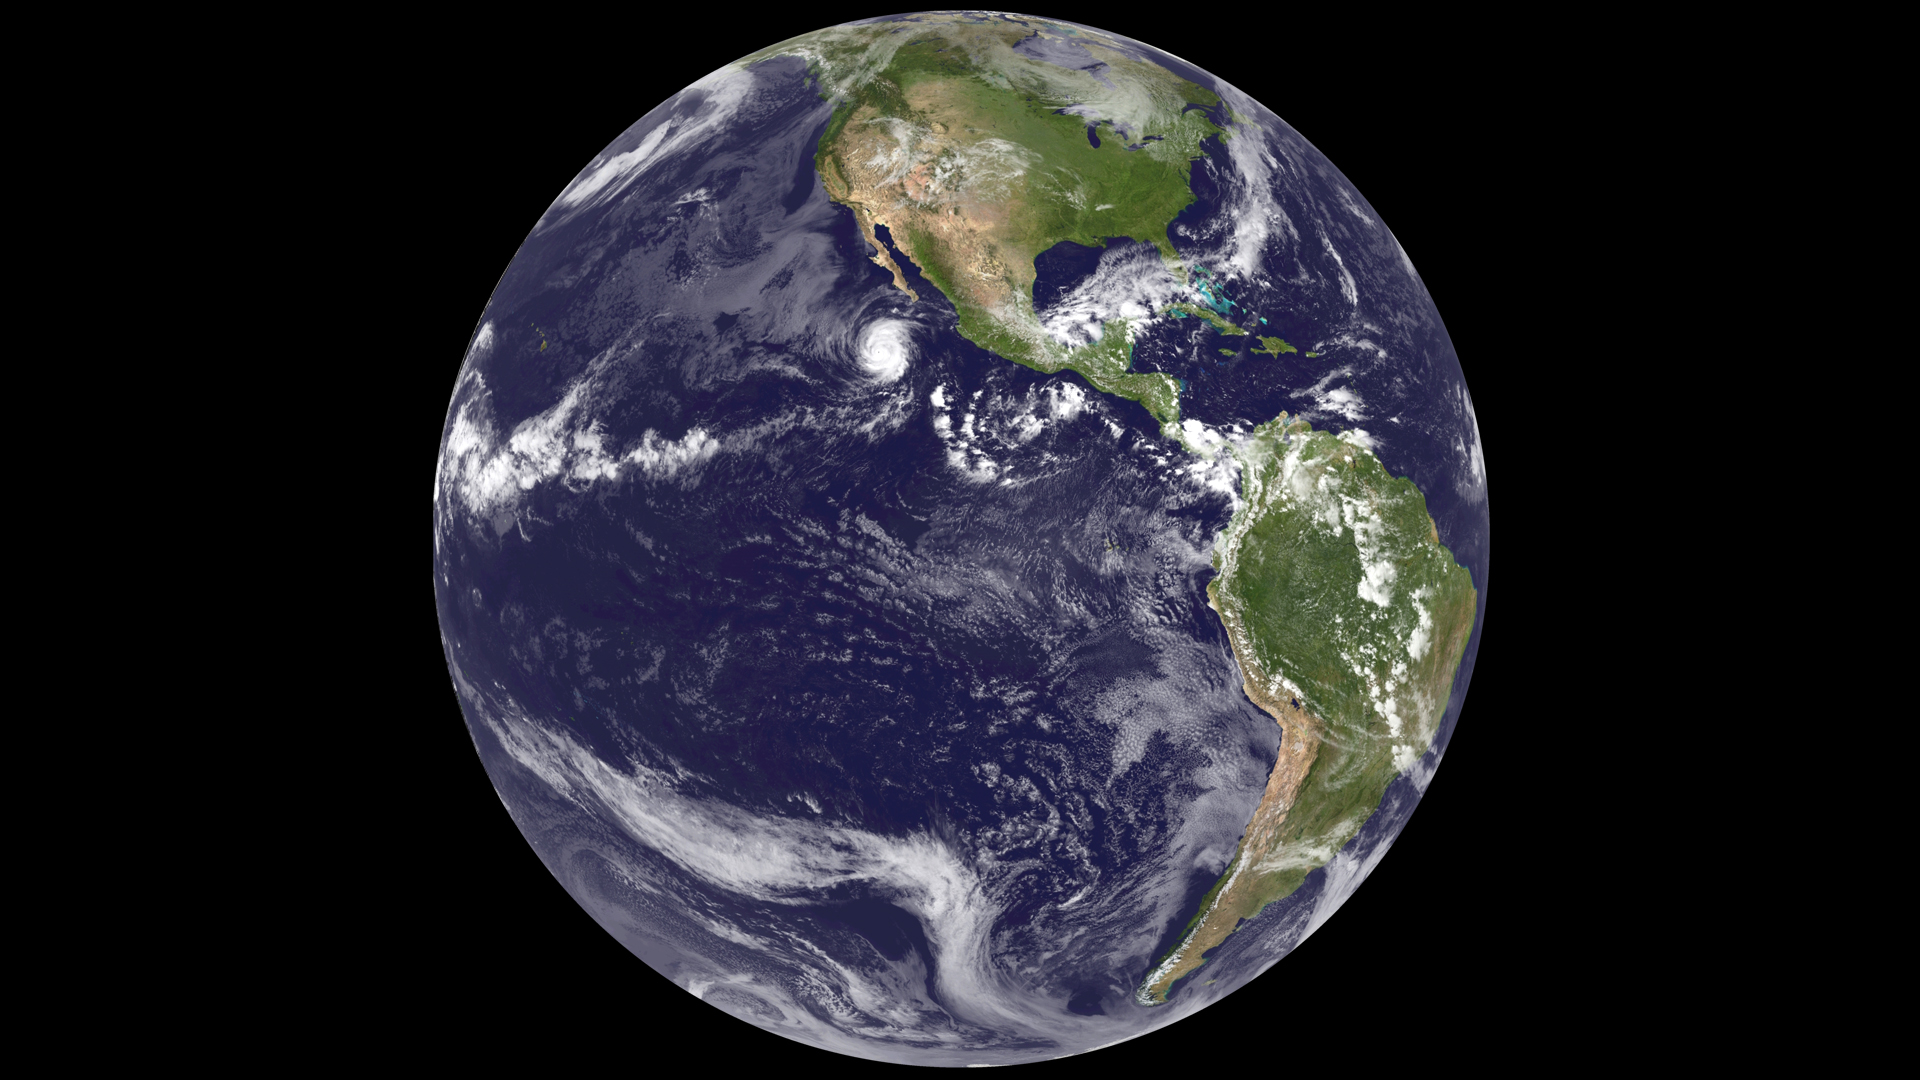 Key US East Coast Weather Satellite GOES-13 Fails